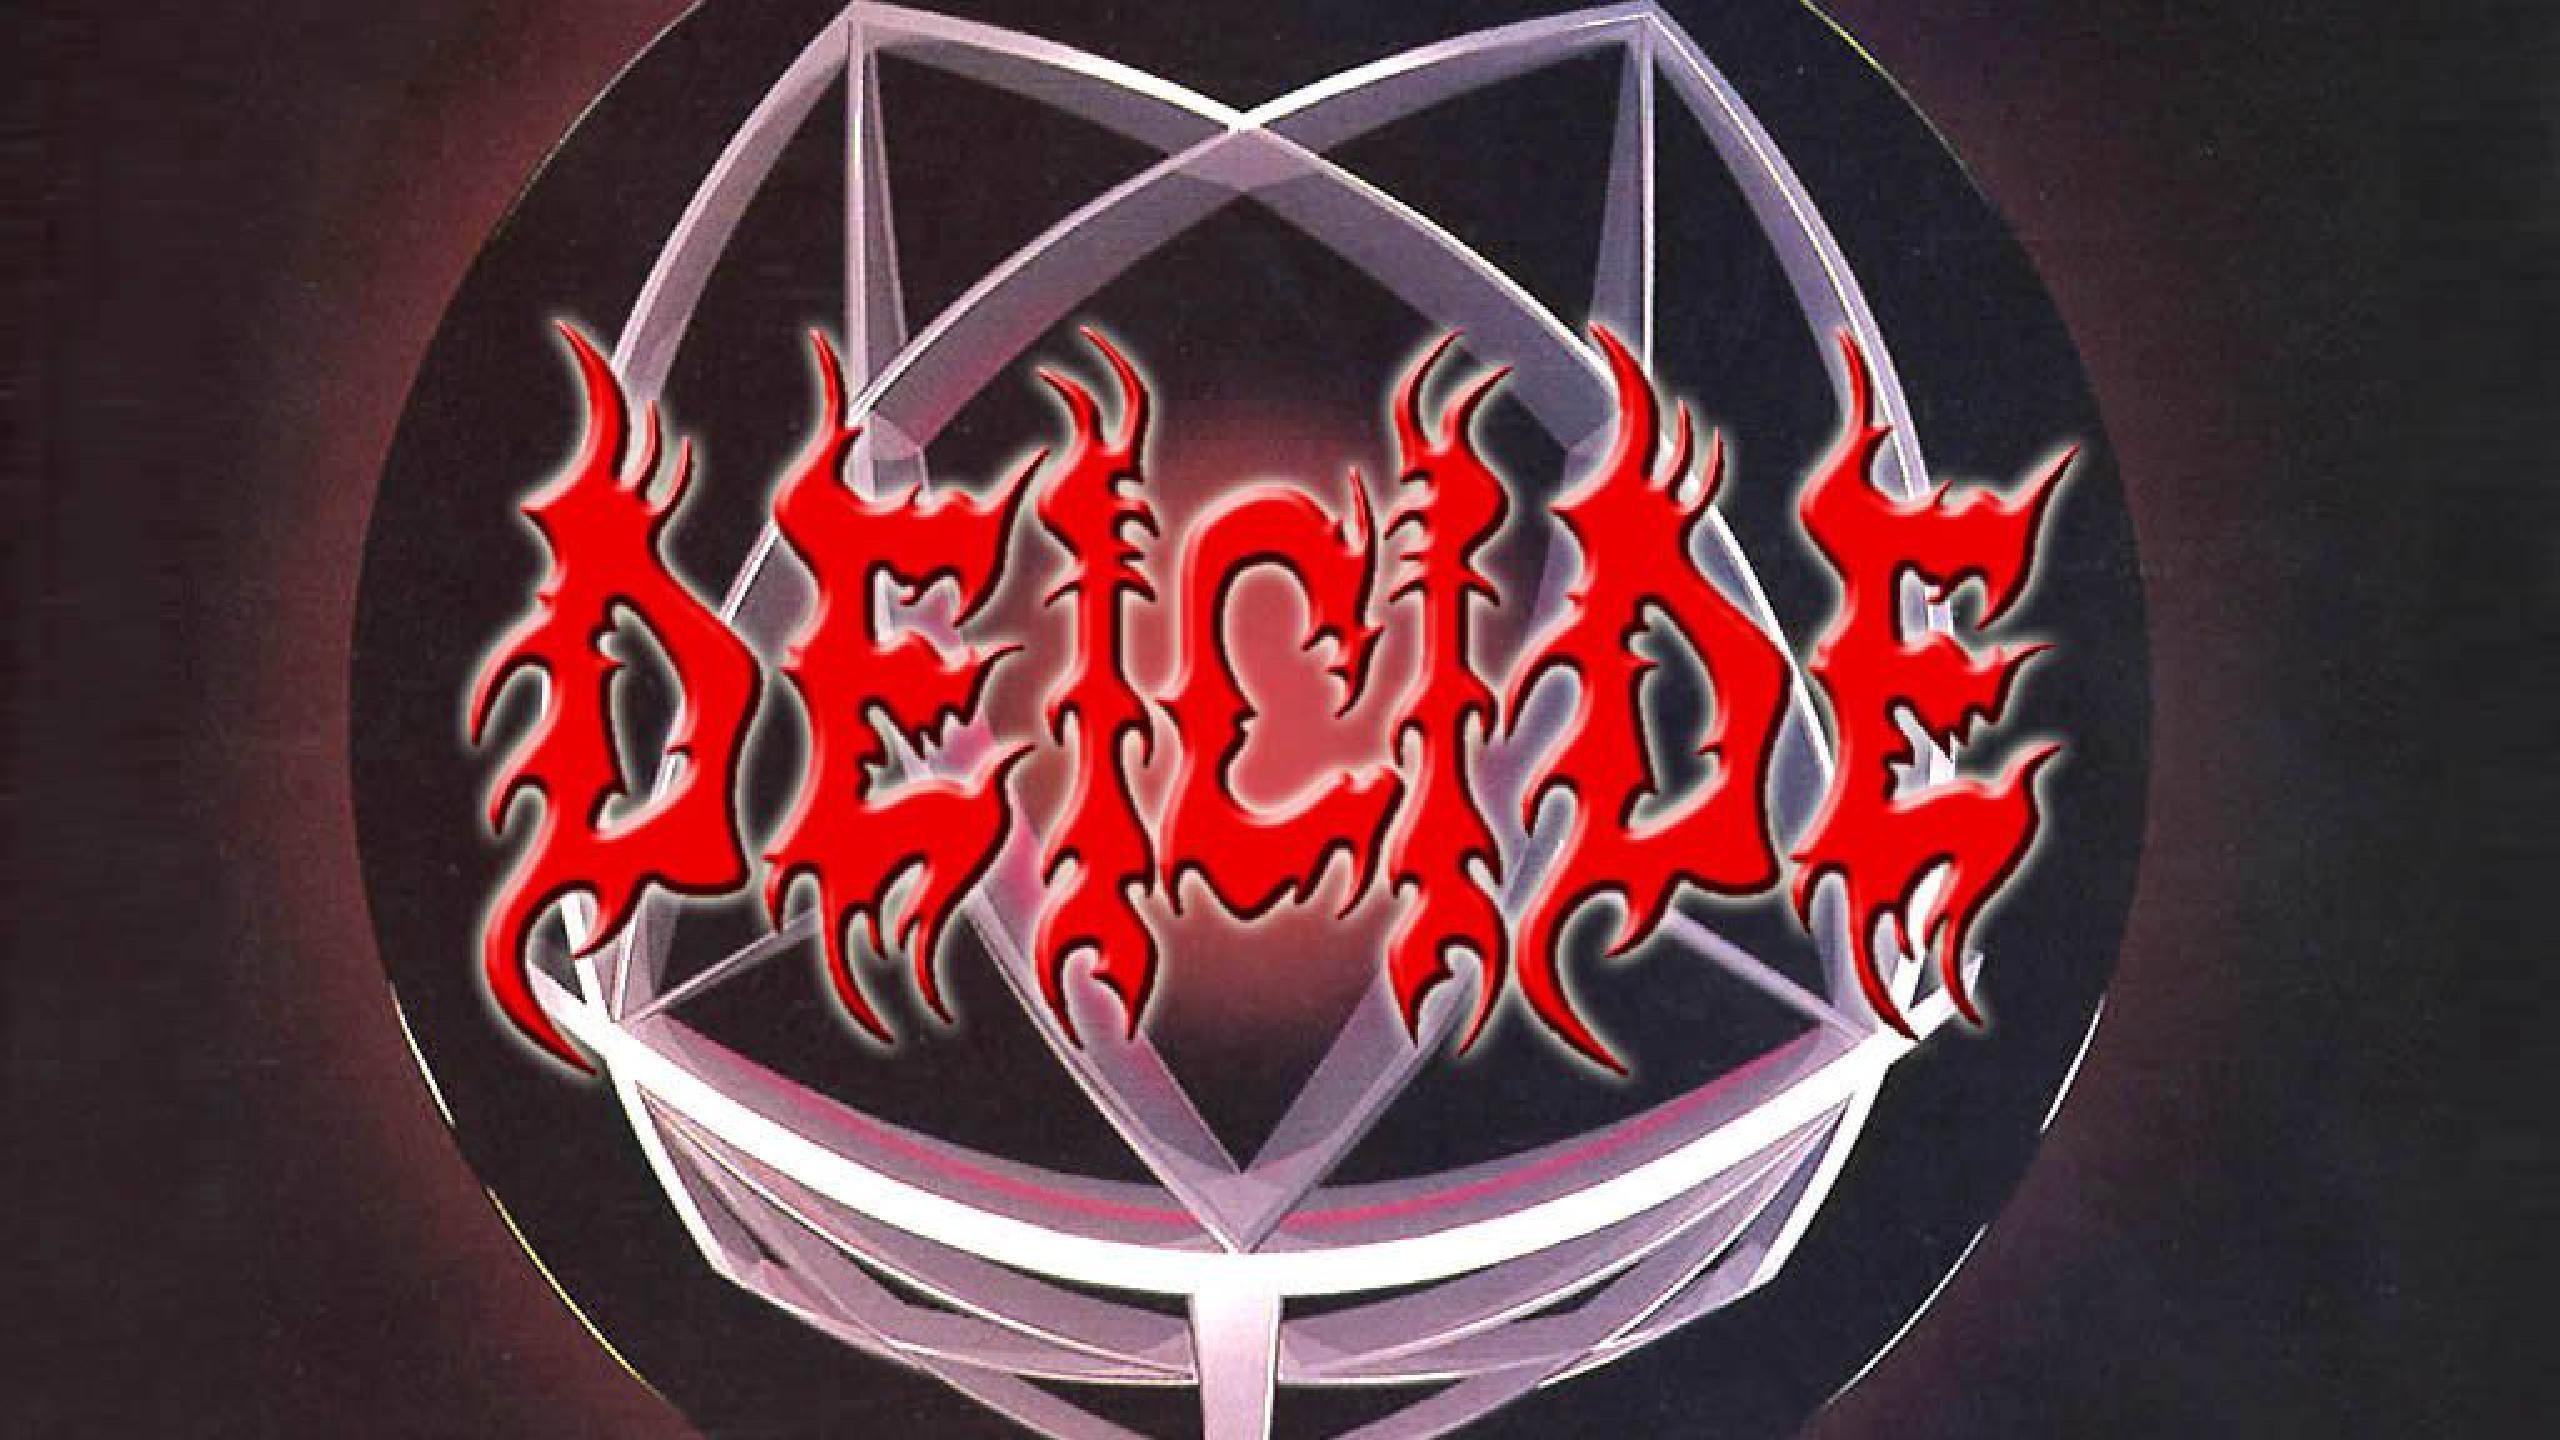 Deicide Tour 2020 Deicide Logo   LogoDix